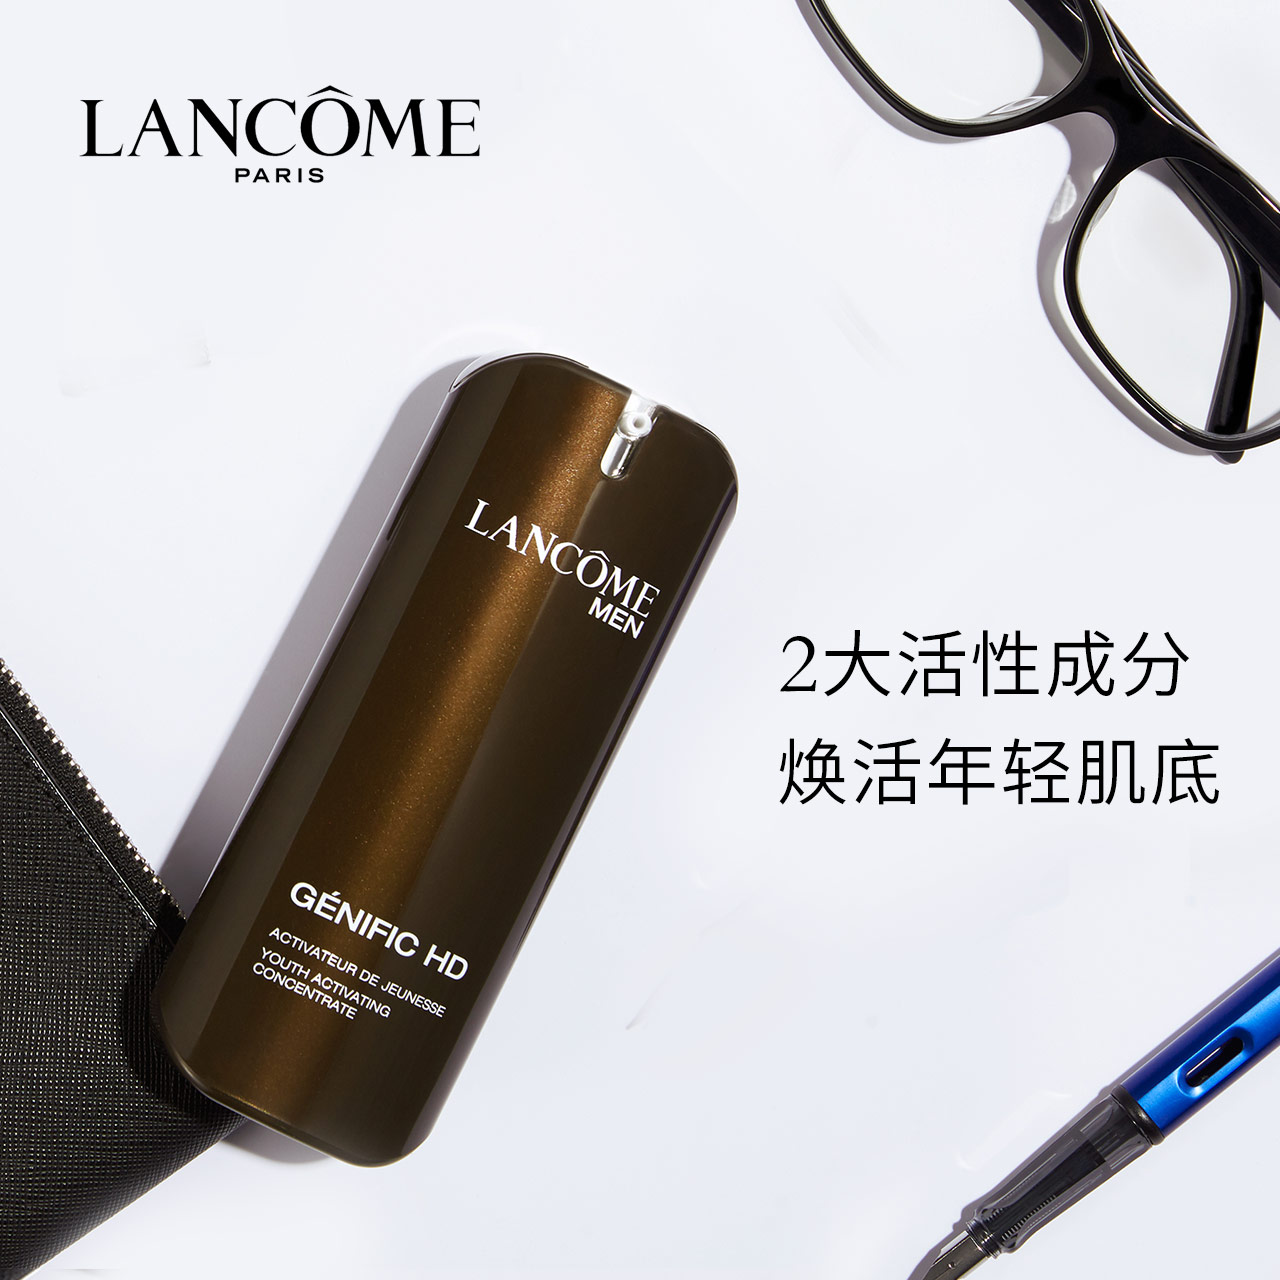 Lancome 兰蔻 男士小黑瓶劲能精华露 50ml ¥373.39